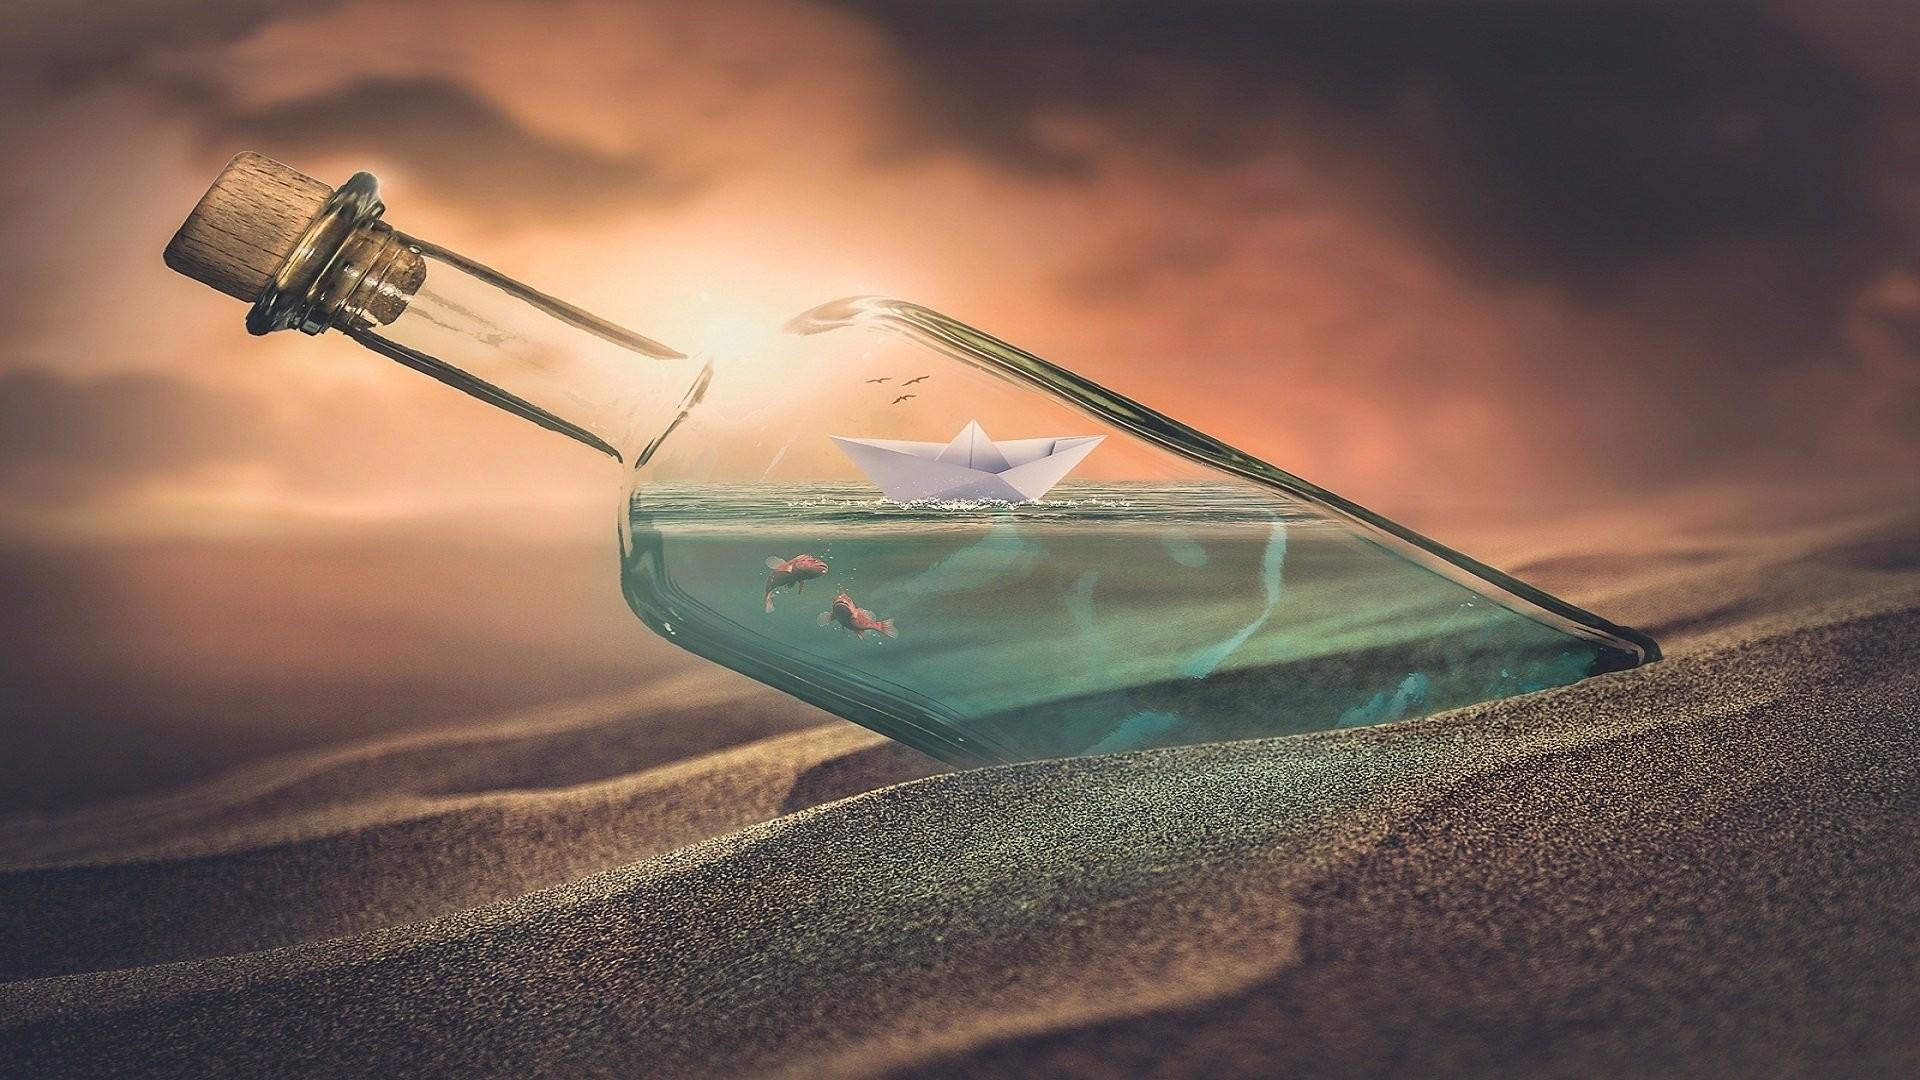 Ship In A Bottle HD Download